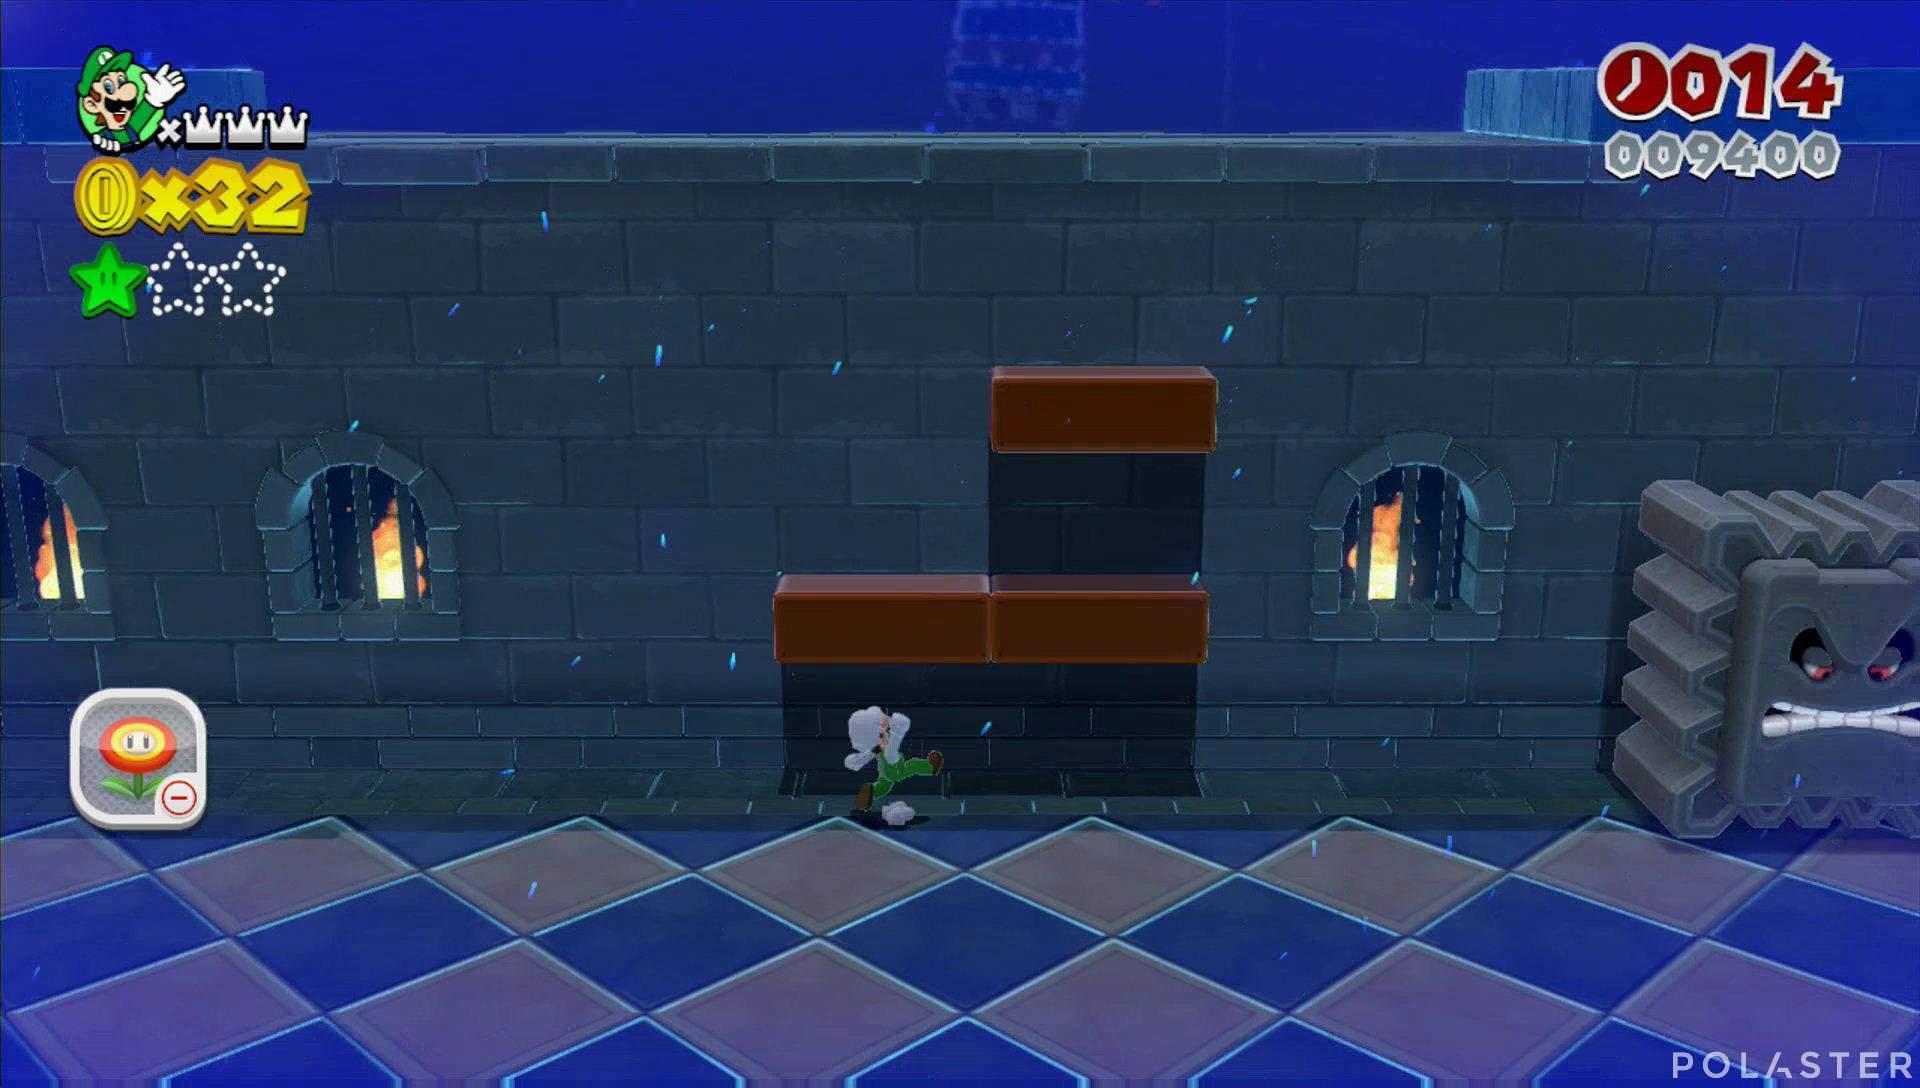 Super Mario 3D World Mundo Flor-4 Estrella 2